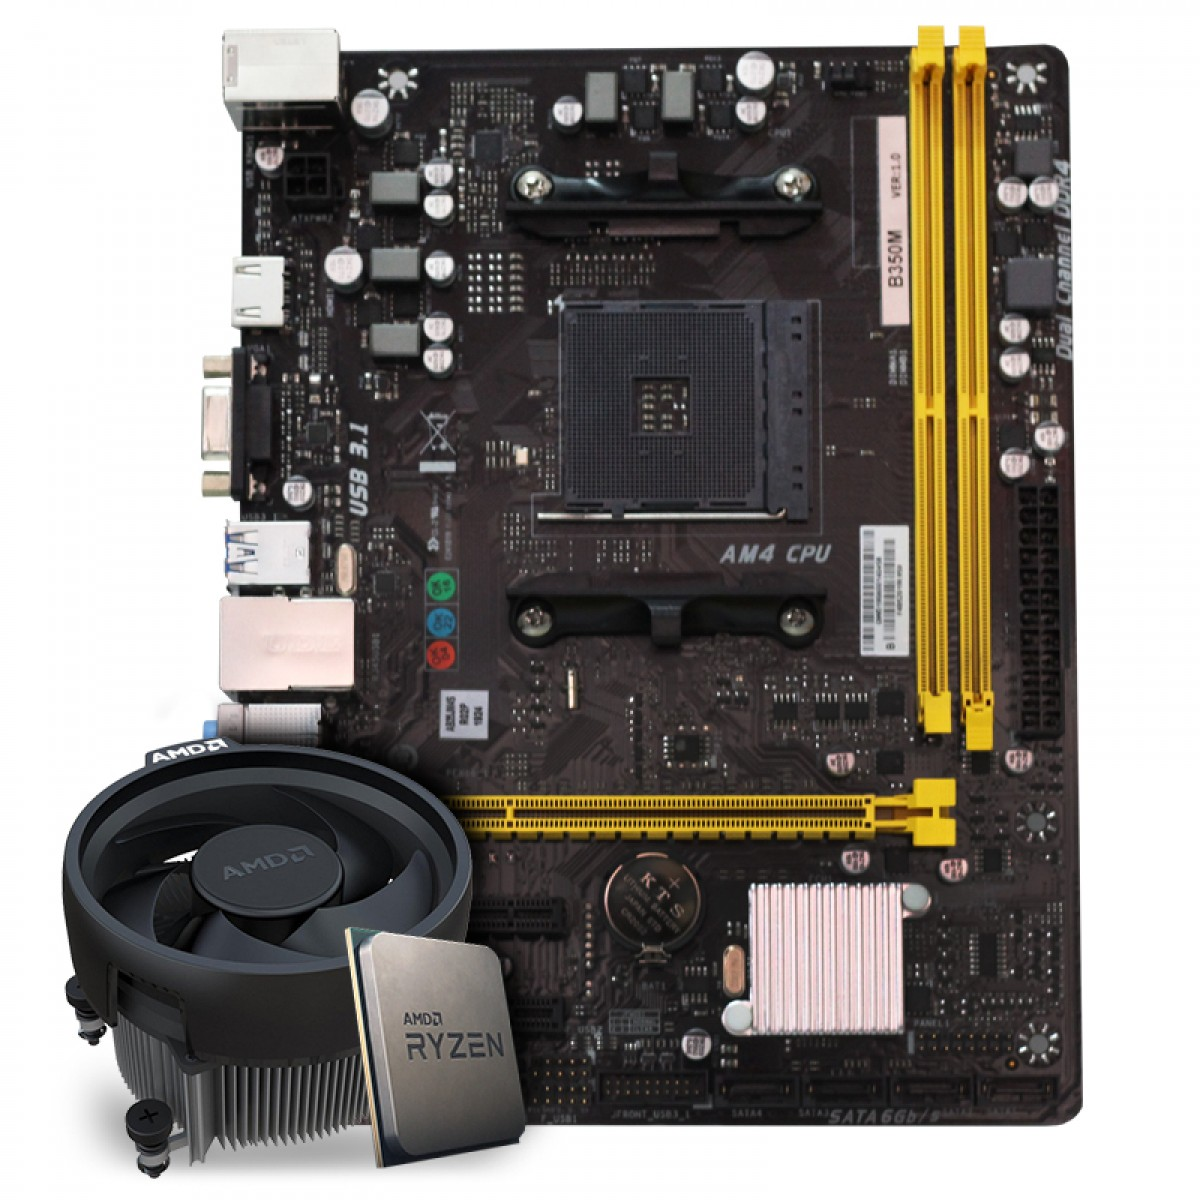 Kit Upgrade Placa Mãe Biostar Biostar B350M AMD AM4 + Processador AMD Ryzen 5 3600 3.6GHz